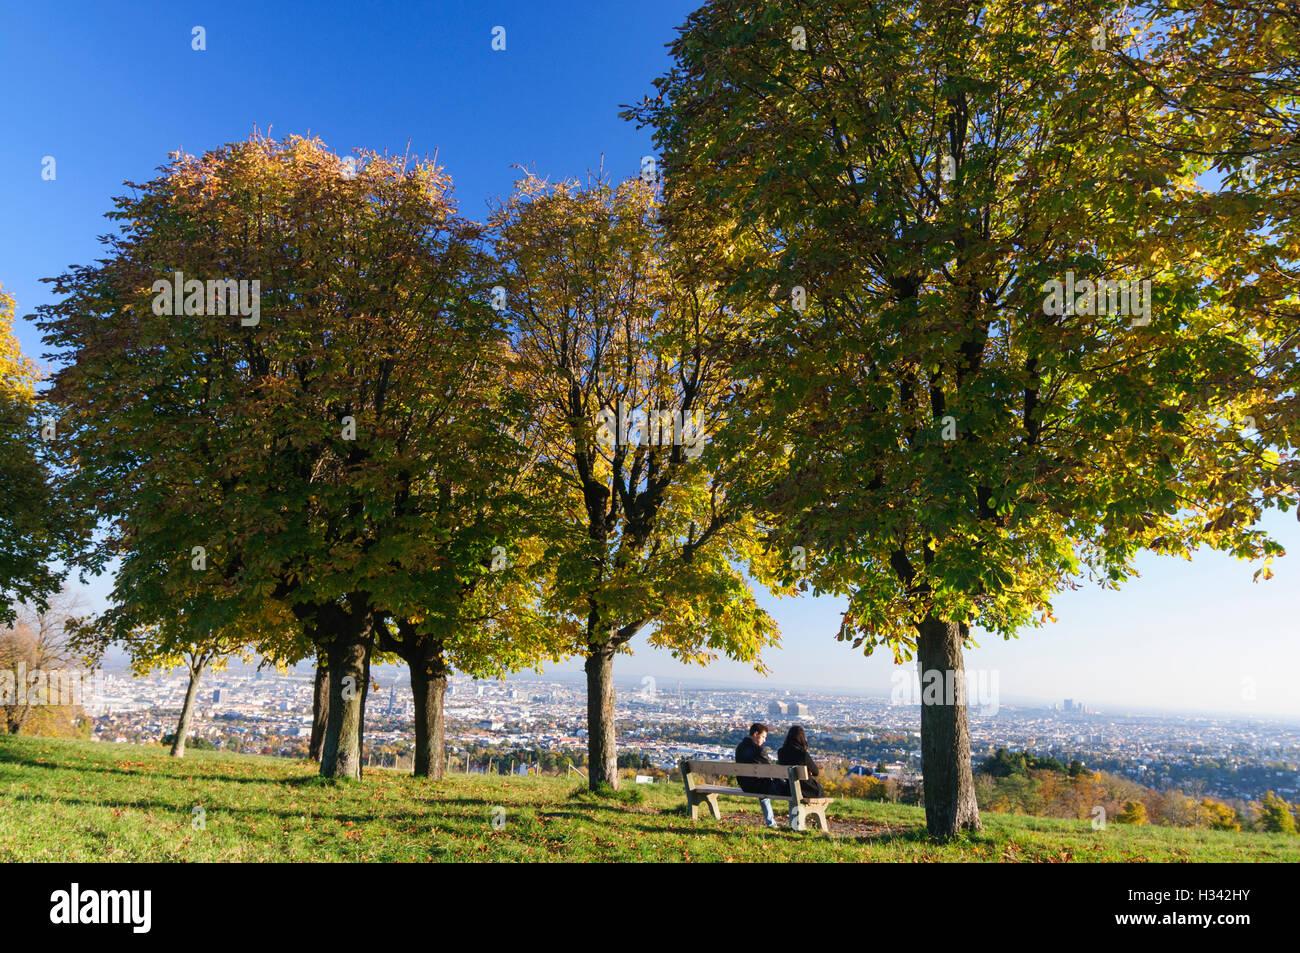 "Wien, Vienna: View of Vienna from the Hill 'Himmel"", 00., Wien, Austria - Stock Image"